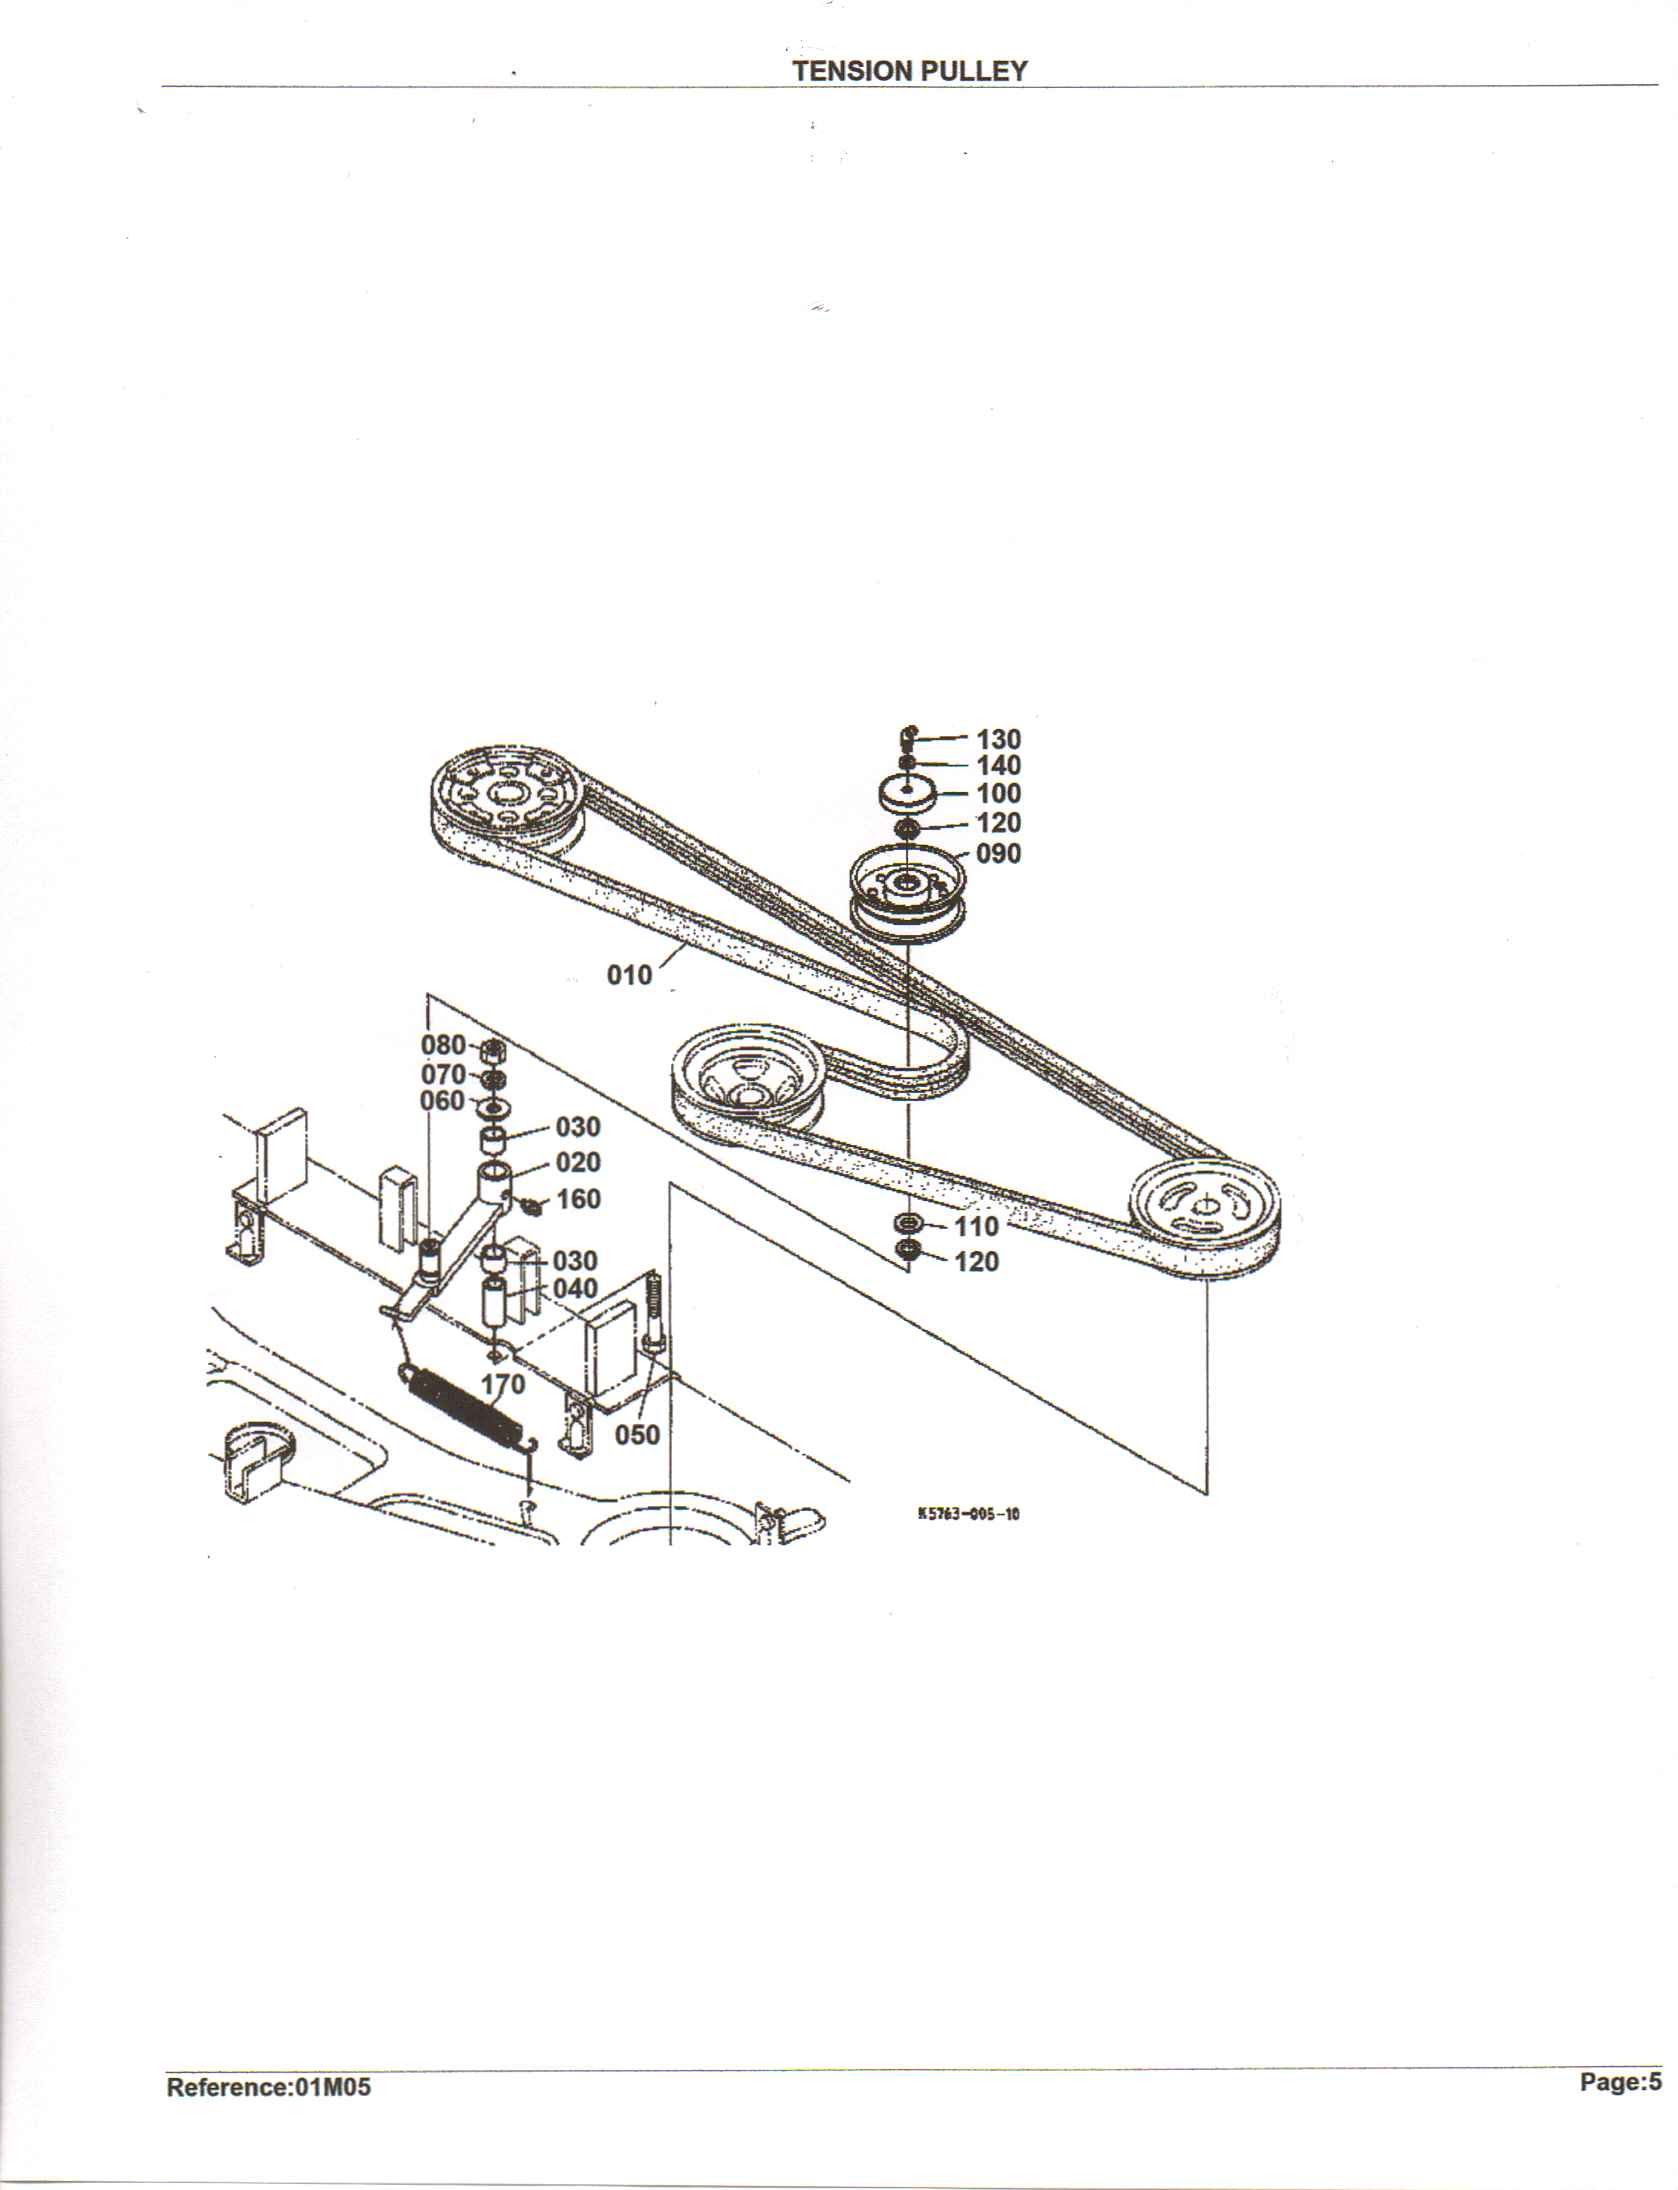 Diagram Kubota Zg20 Belt Diagram Full Version Hd Quality Belt Diagram Diagramatix18 Incomingweb It